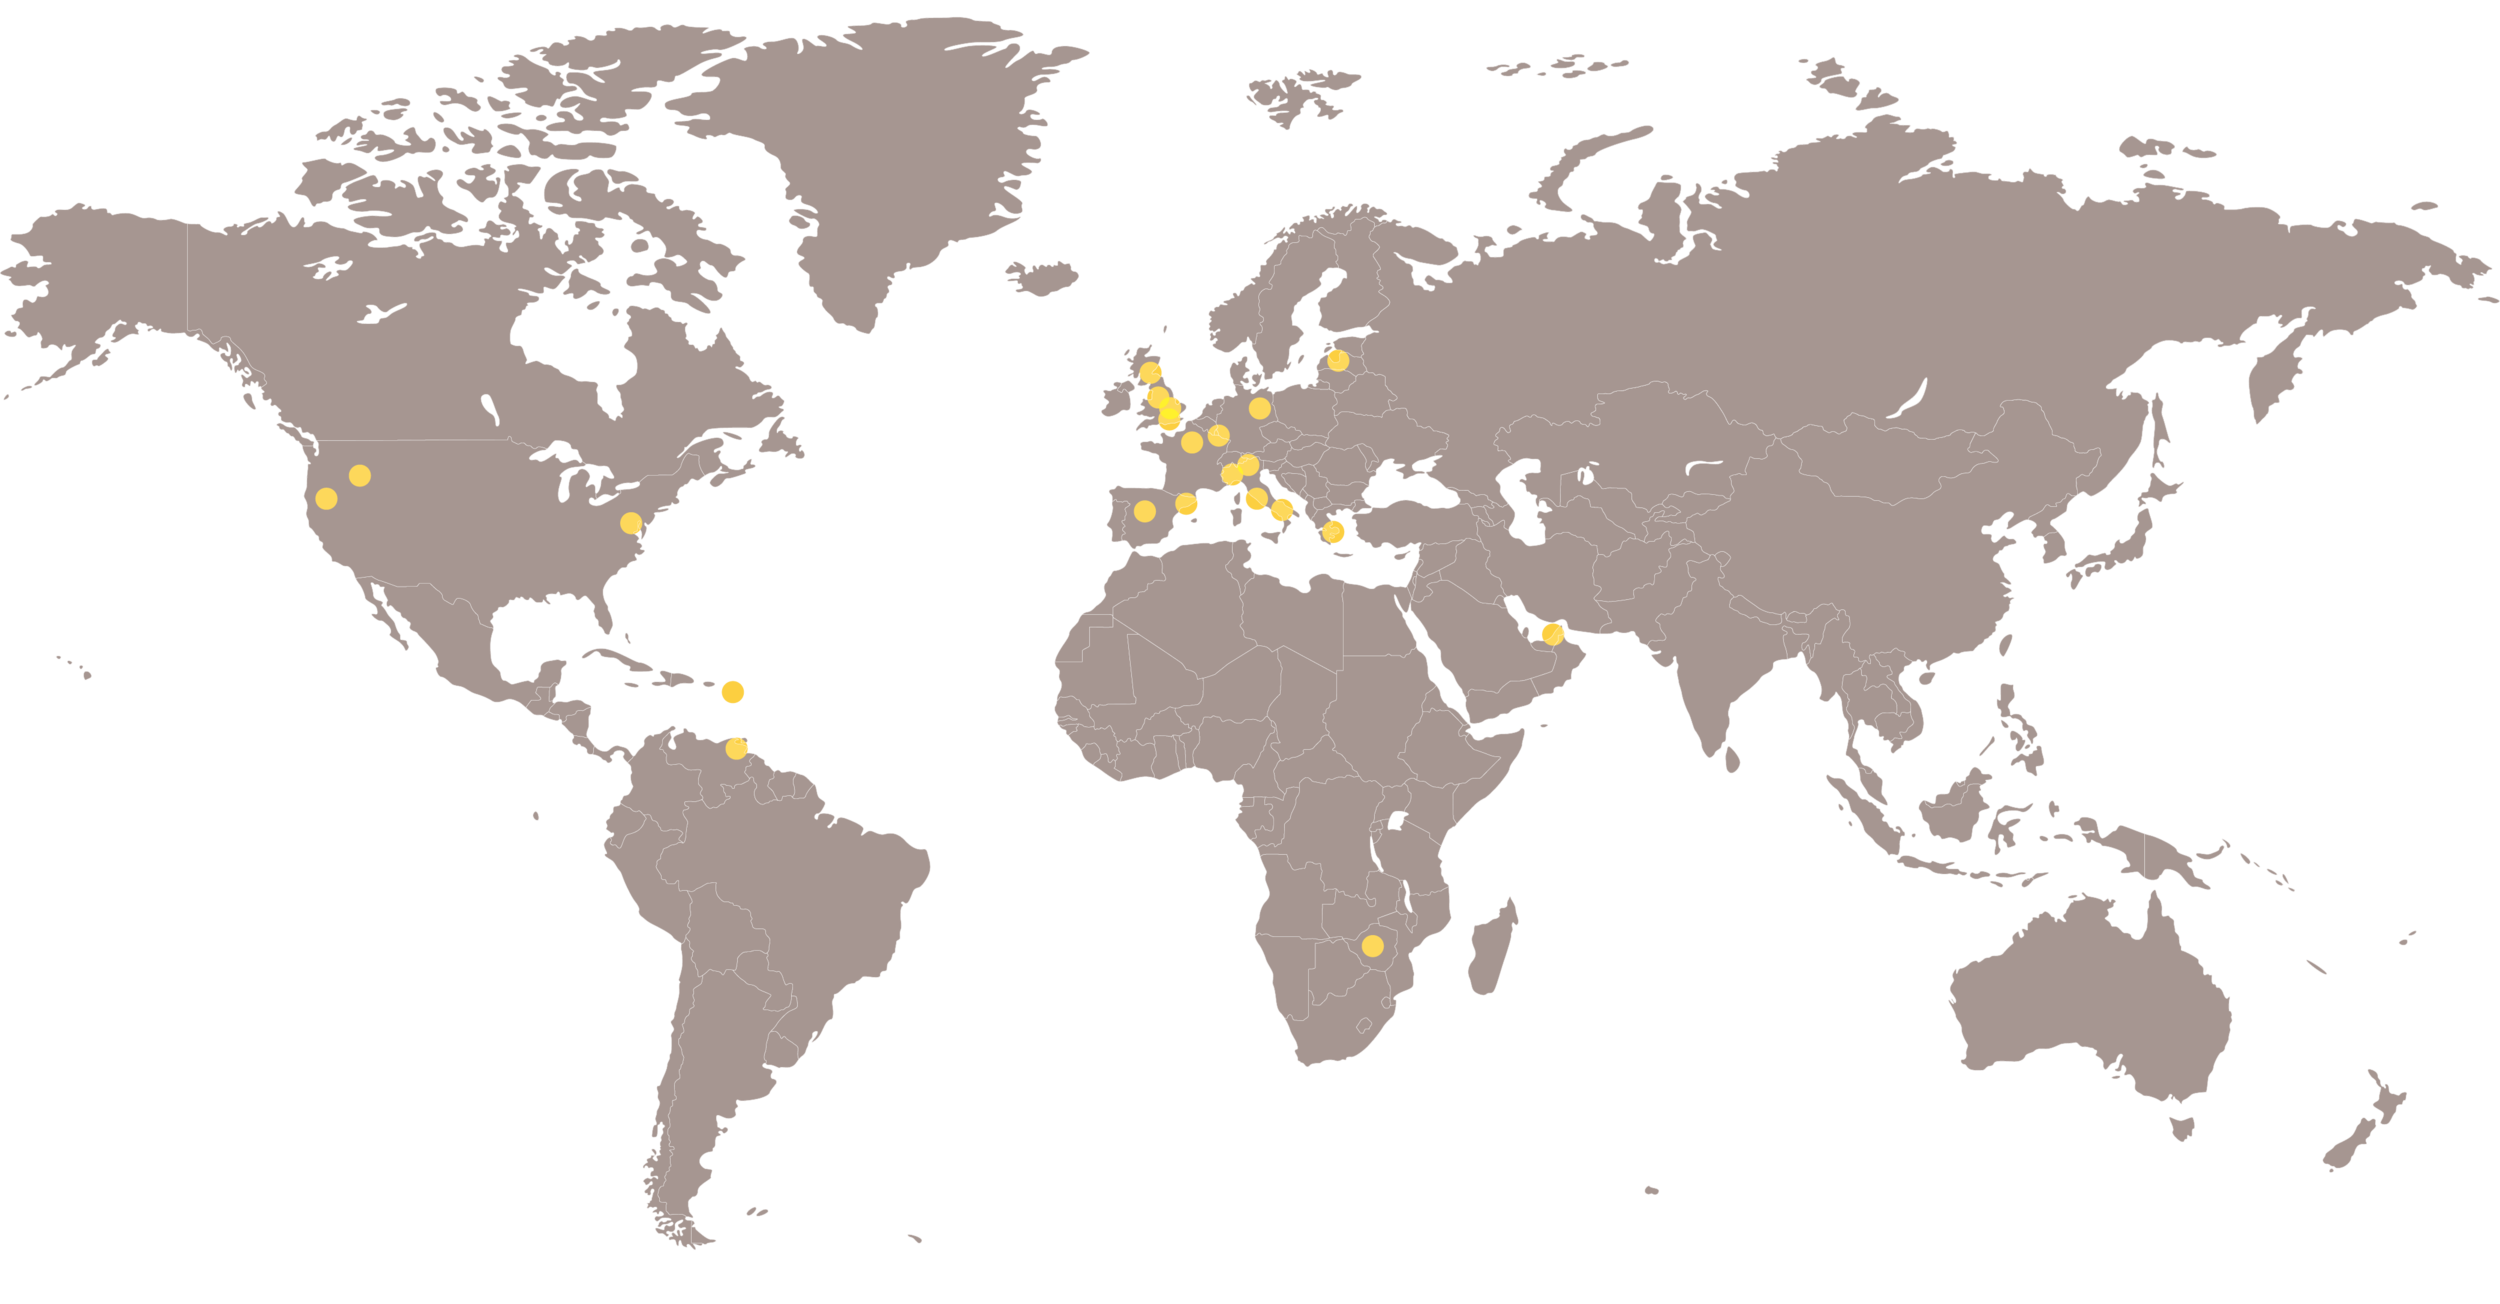 Hubdotmap-01.png